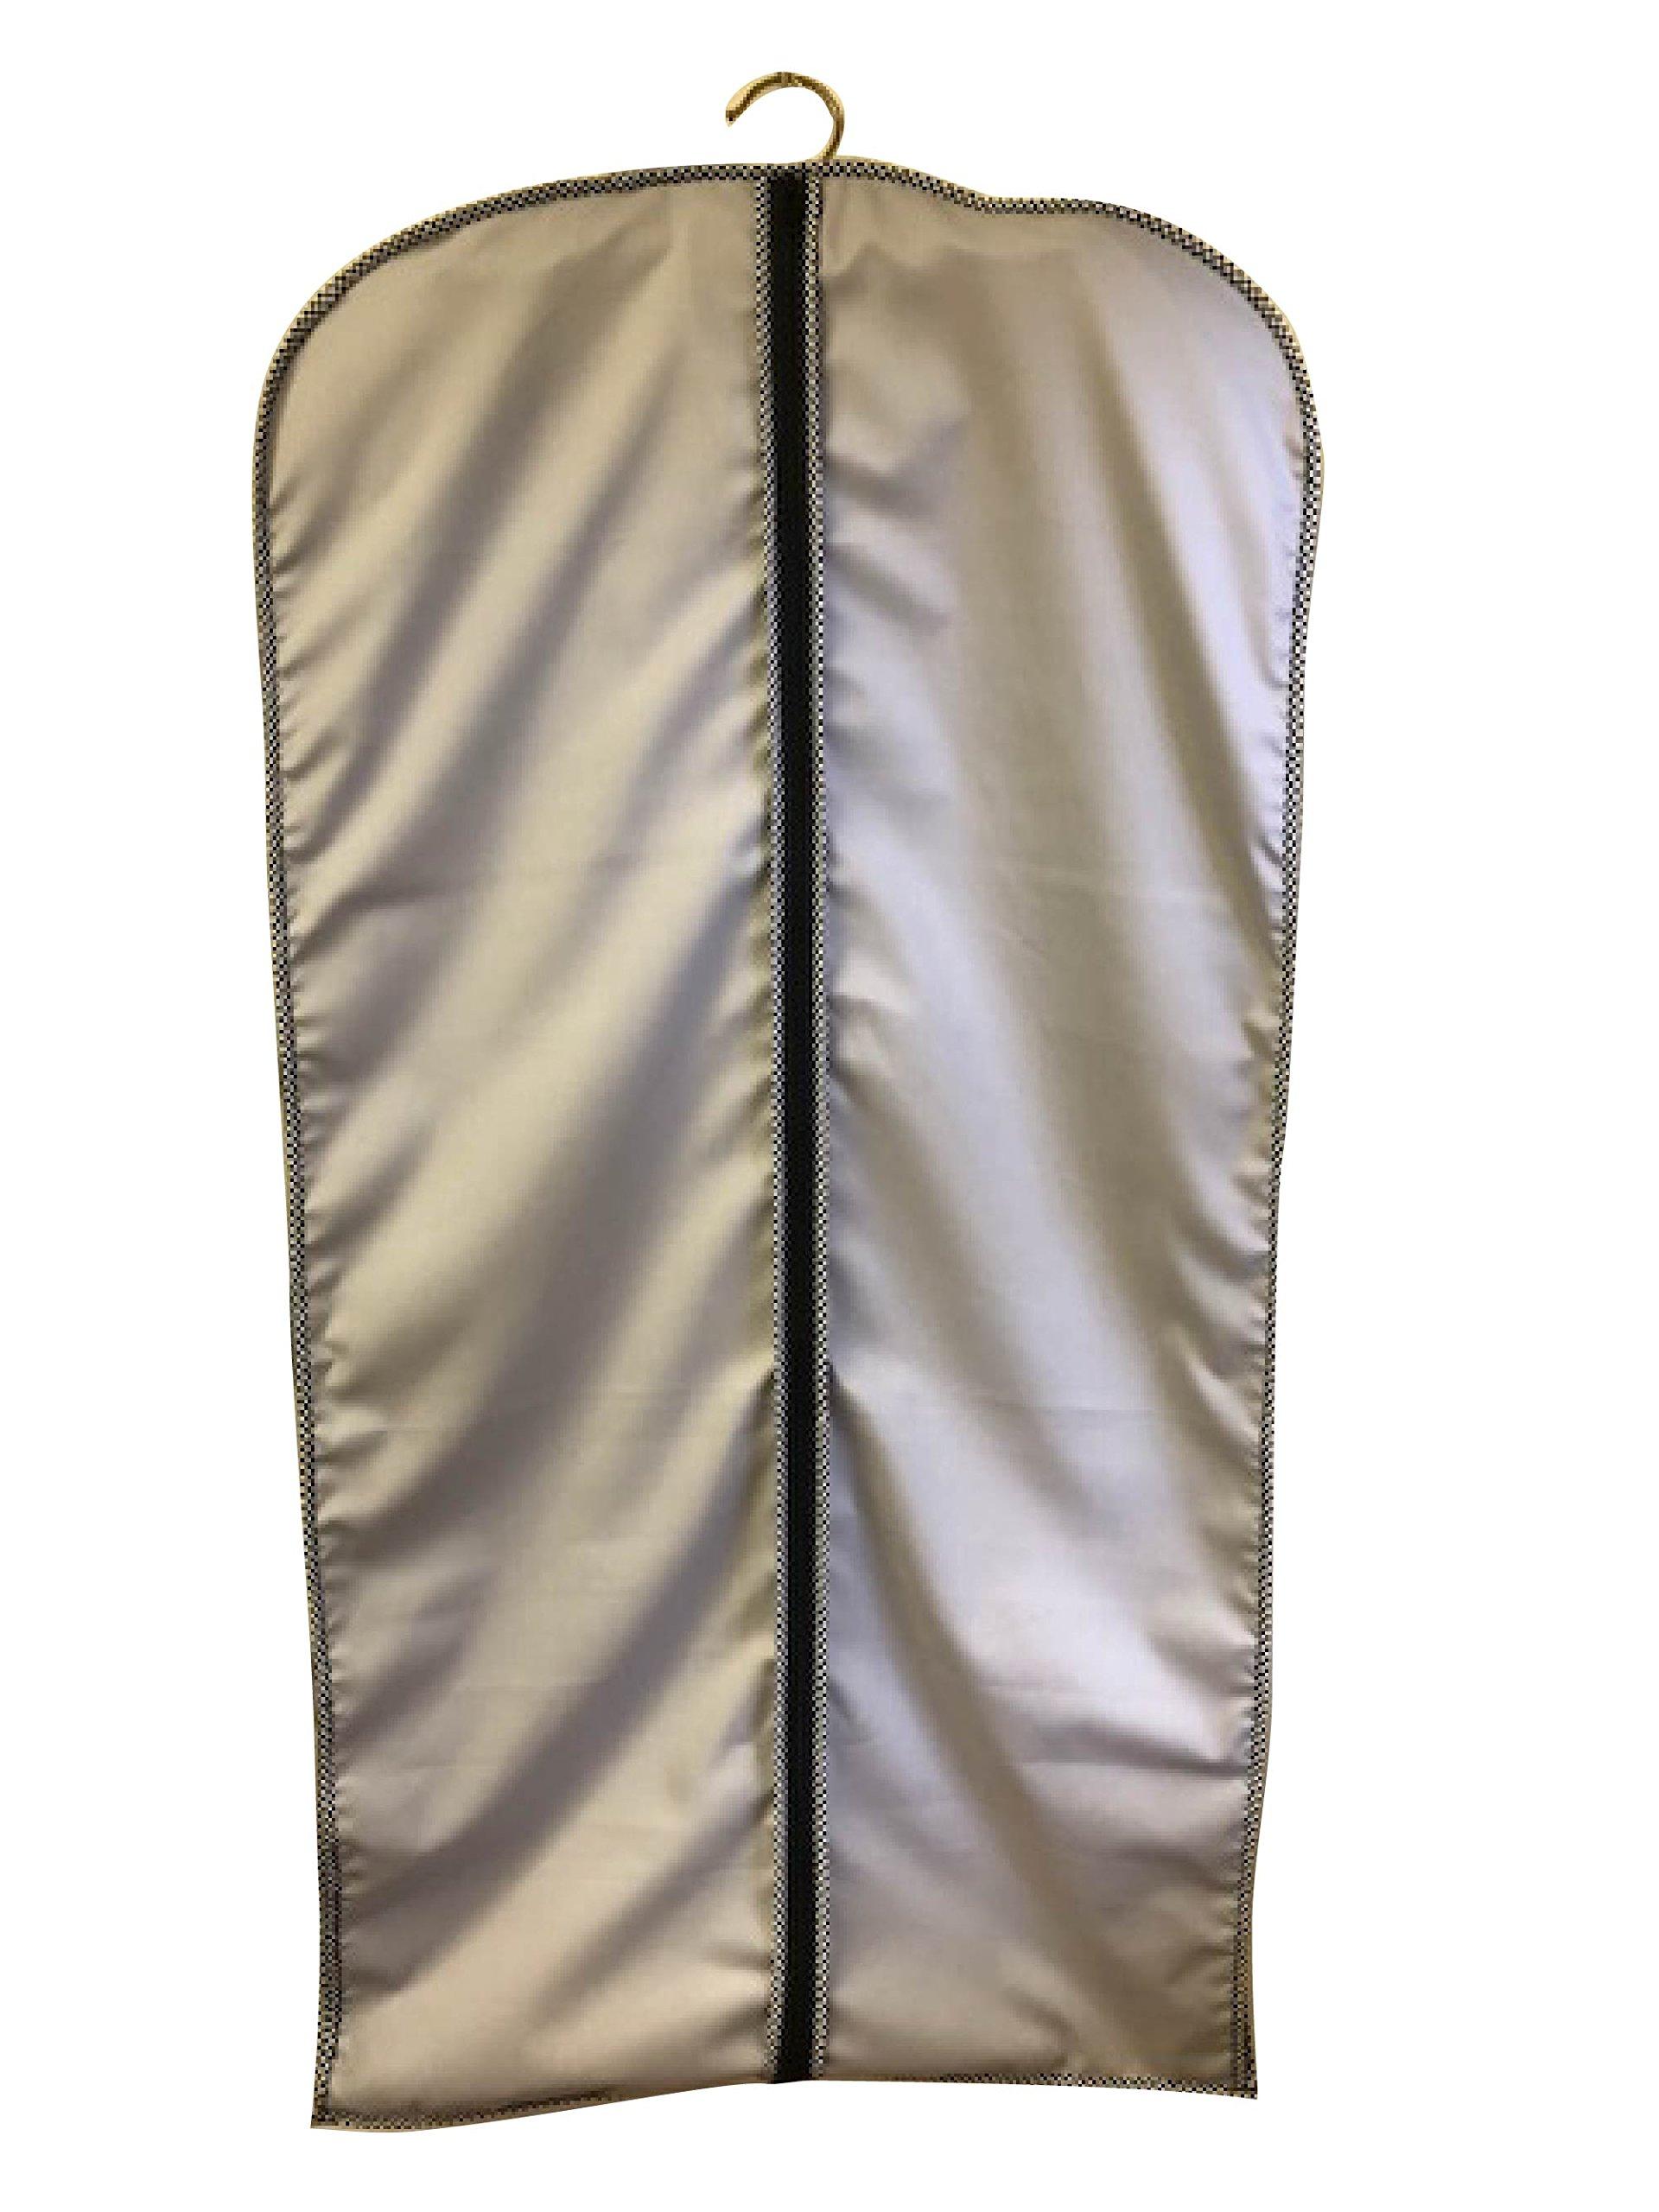 Breathable Cotton Cloth Dress Garment Bag, 45'' Grey/Herringbone Trim, TUVA